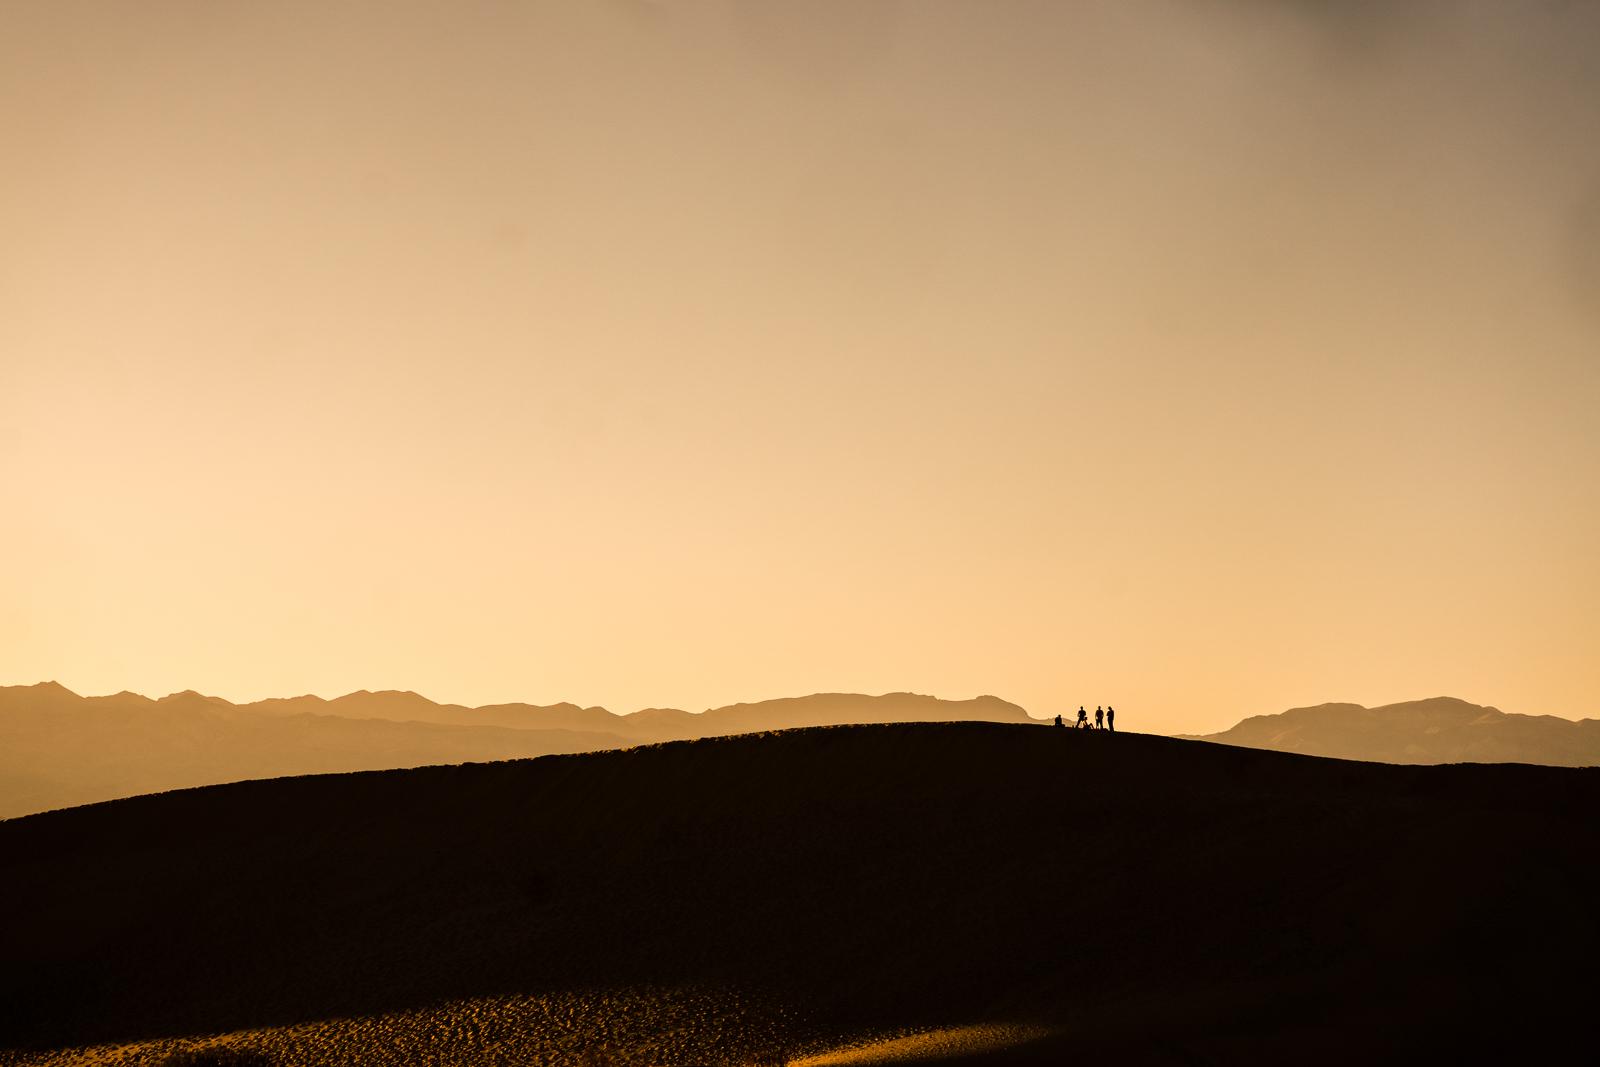 6_Death-Valley-dunes-landscape_Joseph-Barber-Studios.jpg